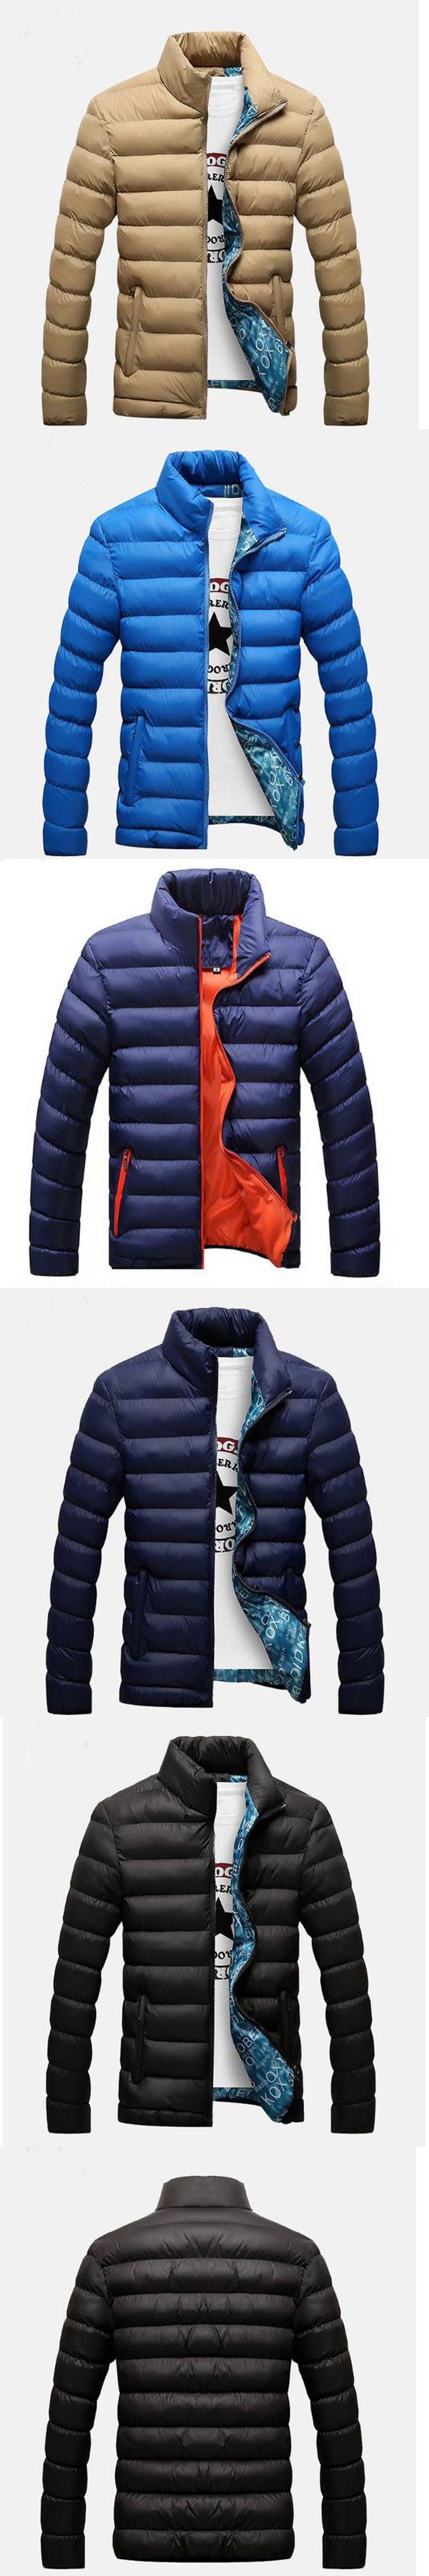 2017 Parka Men Autumn and winter new warm thickening jackers men cotton hats slim Zipper winter jackers mens winter parkas